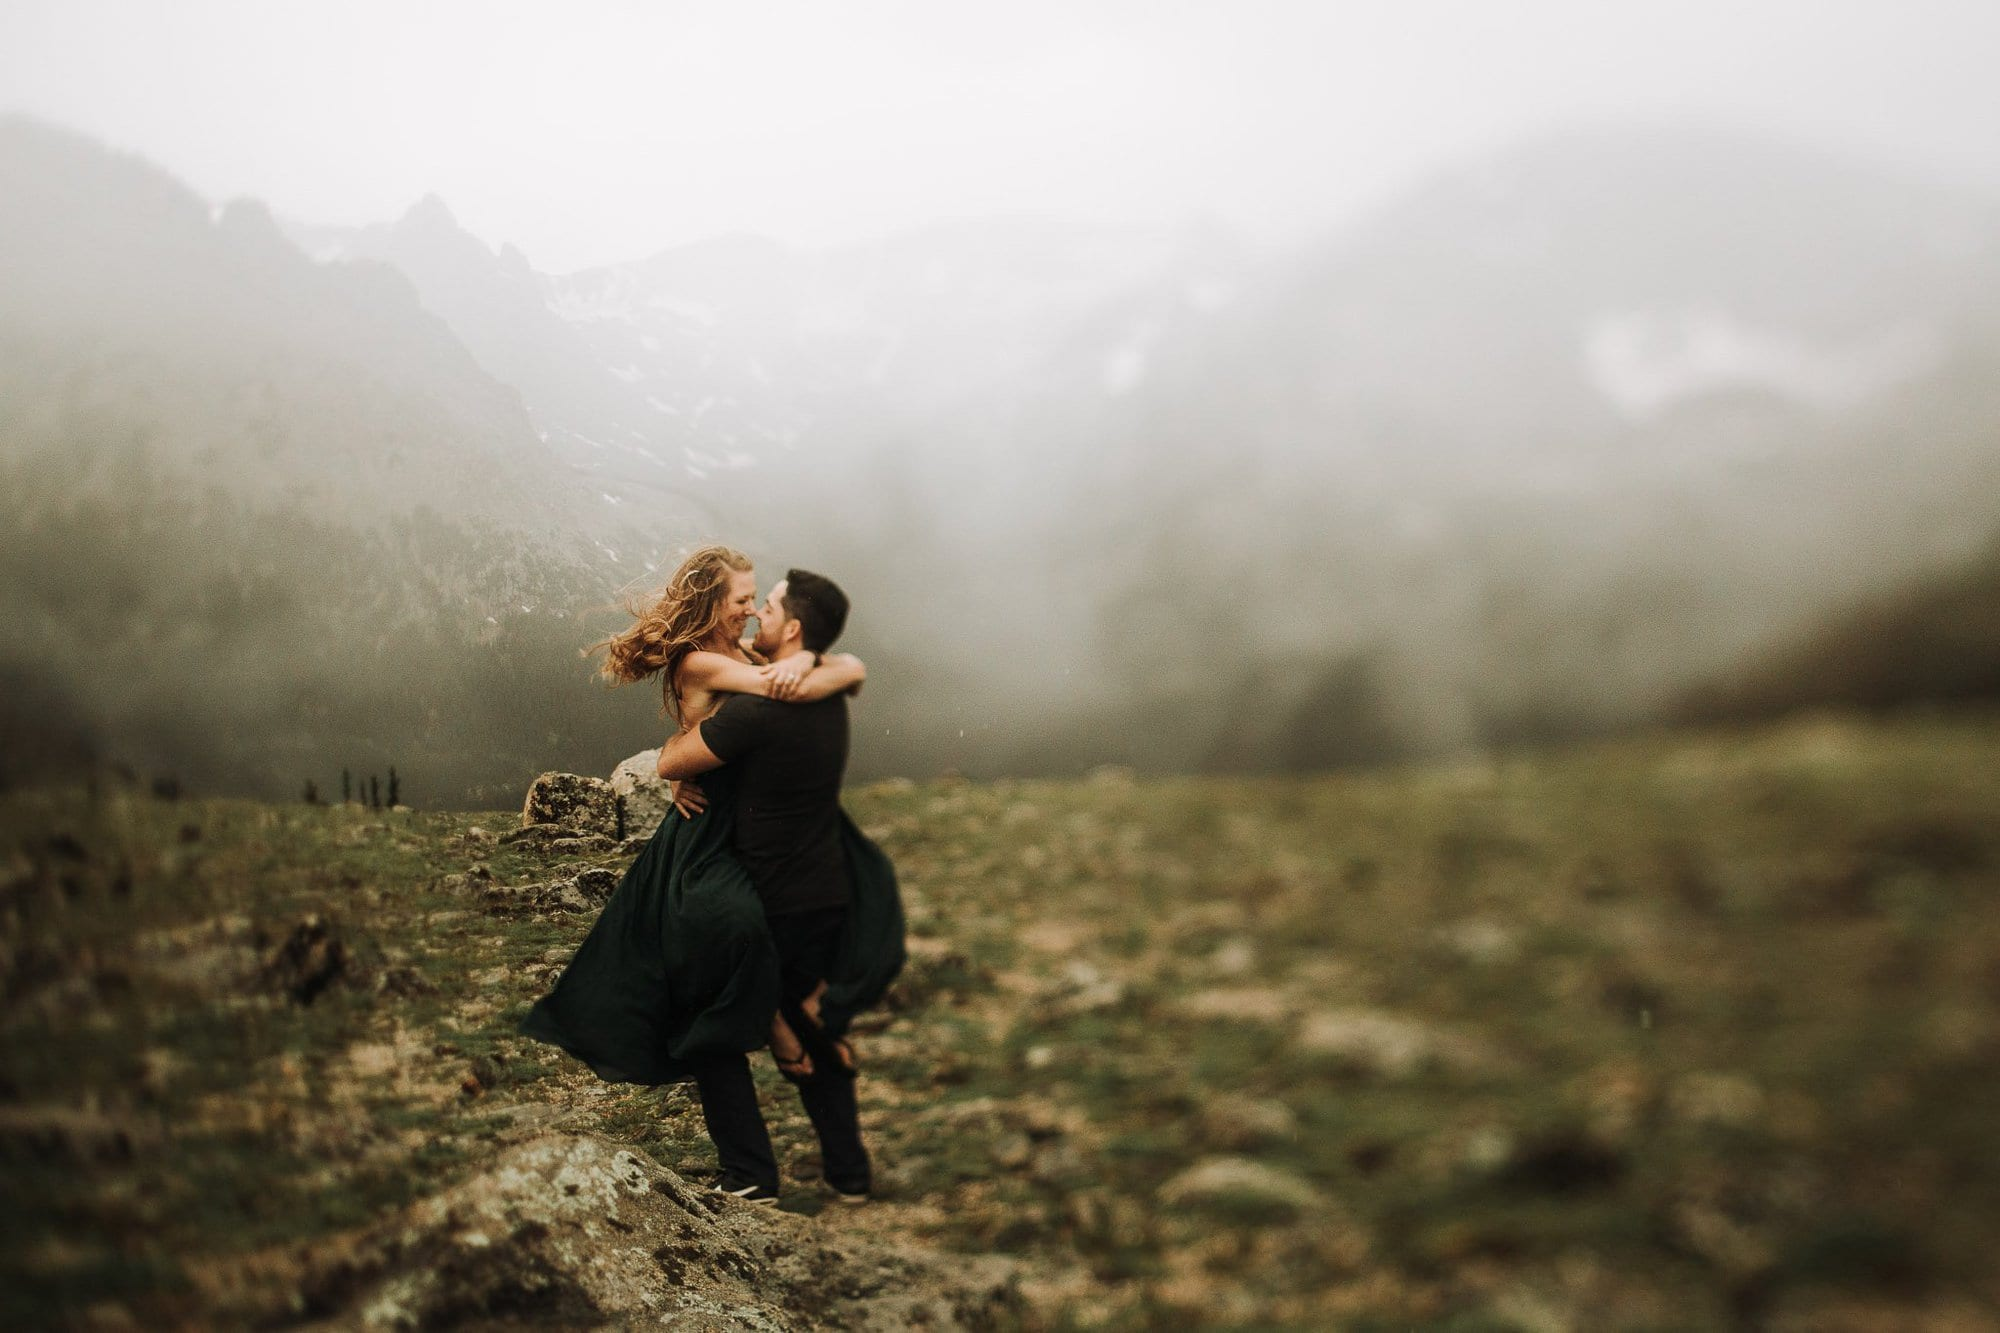 COLORADO MOUNTAIN WEDDINGS|ADVENTURES COLORADO INTIMATE WEDDING + ADVENTUROUS ELOPEMENT PHOTOGRAPHER